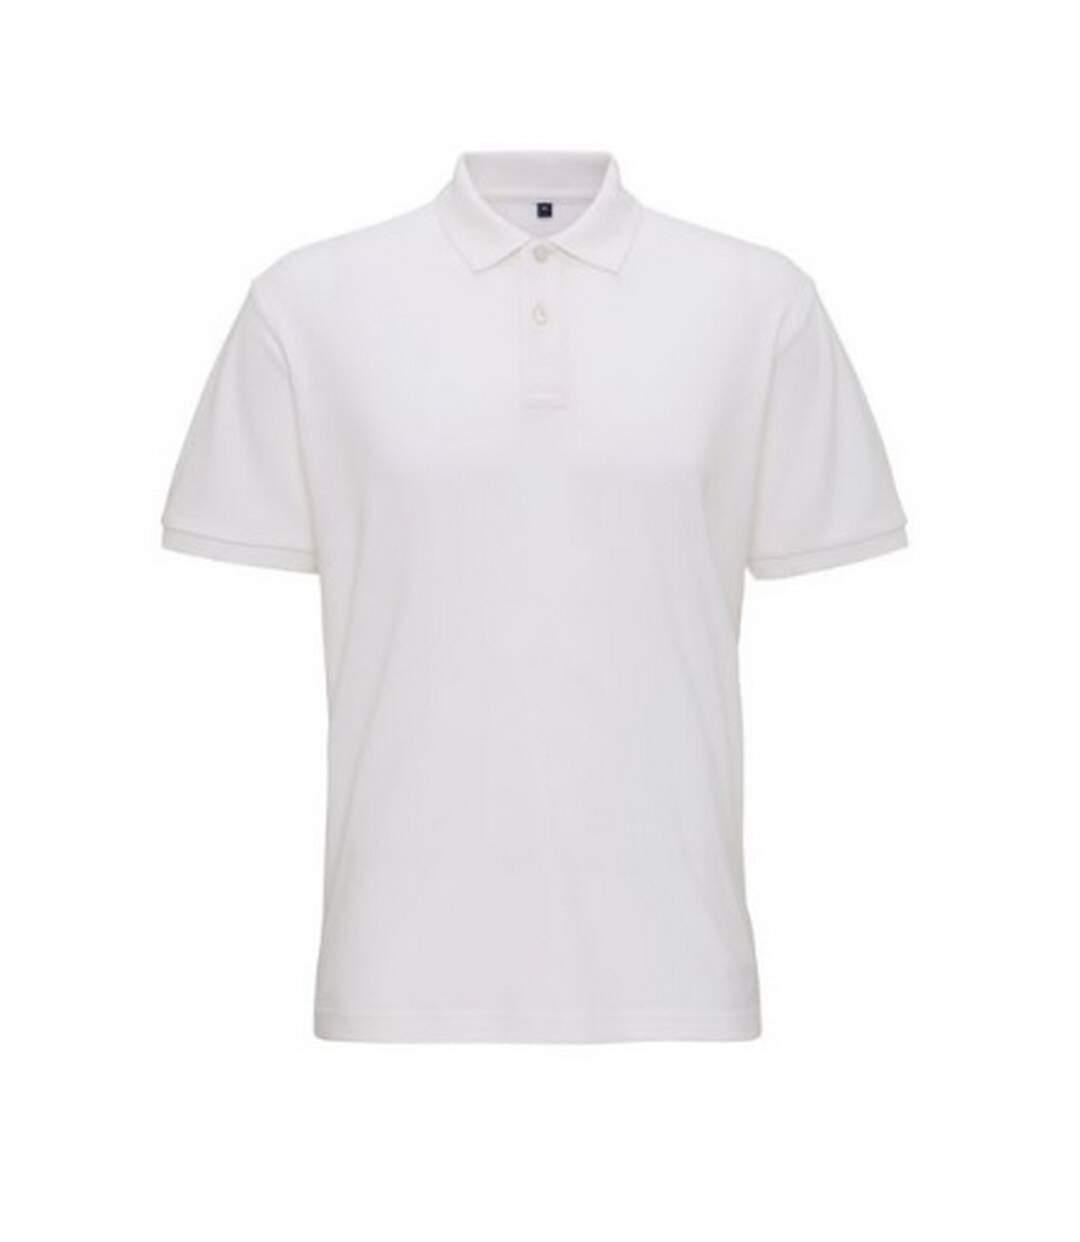 Asquith & Fox Mens Super Smooth Knit Polo Shirt (White) - UTRW6026